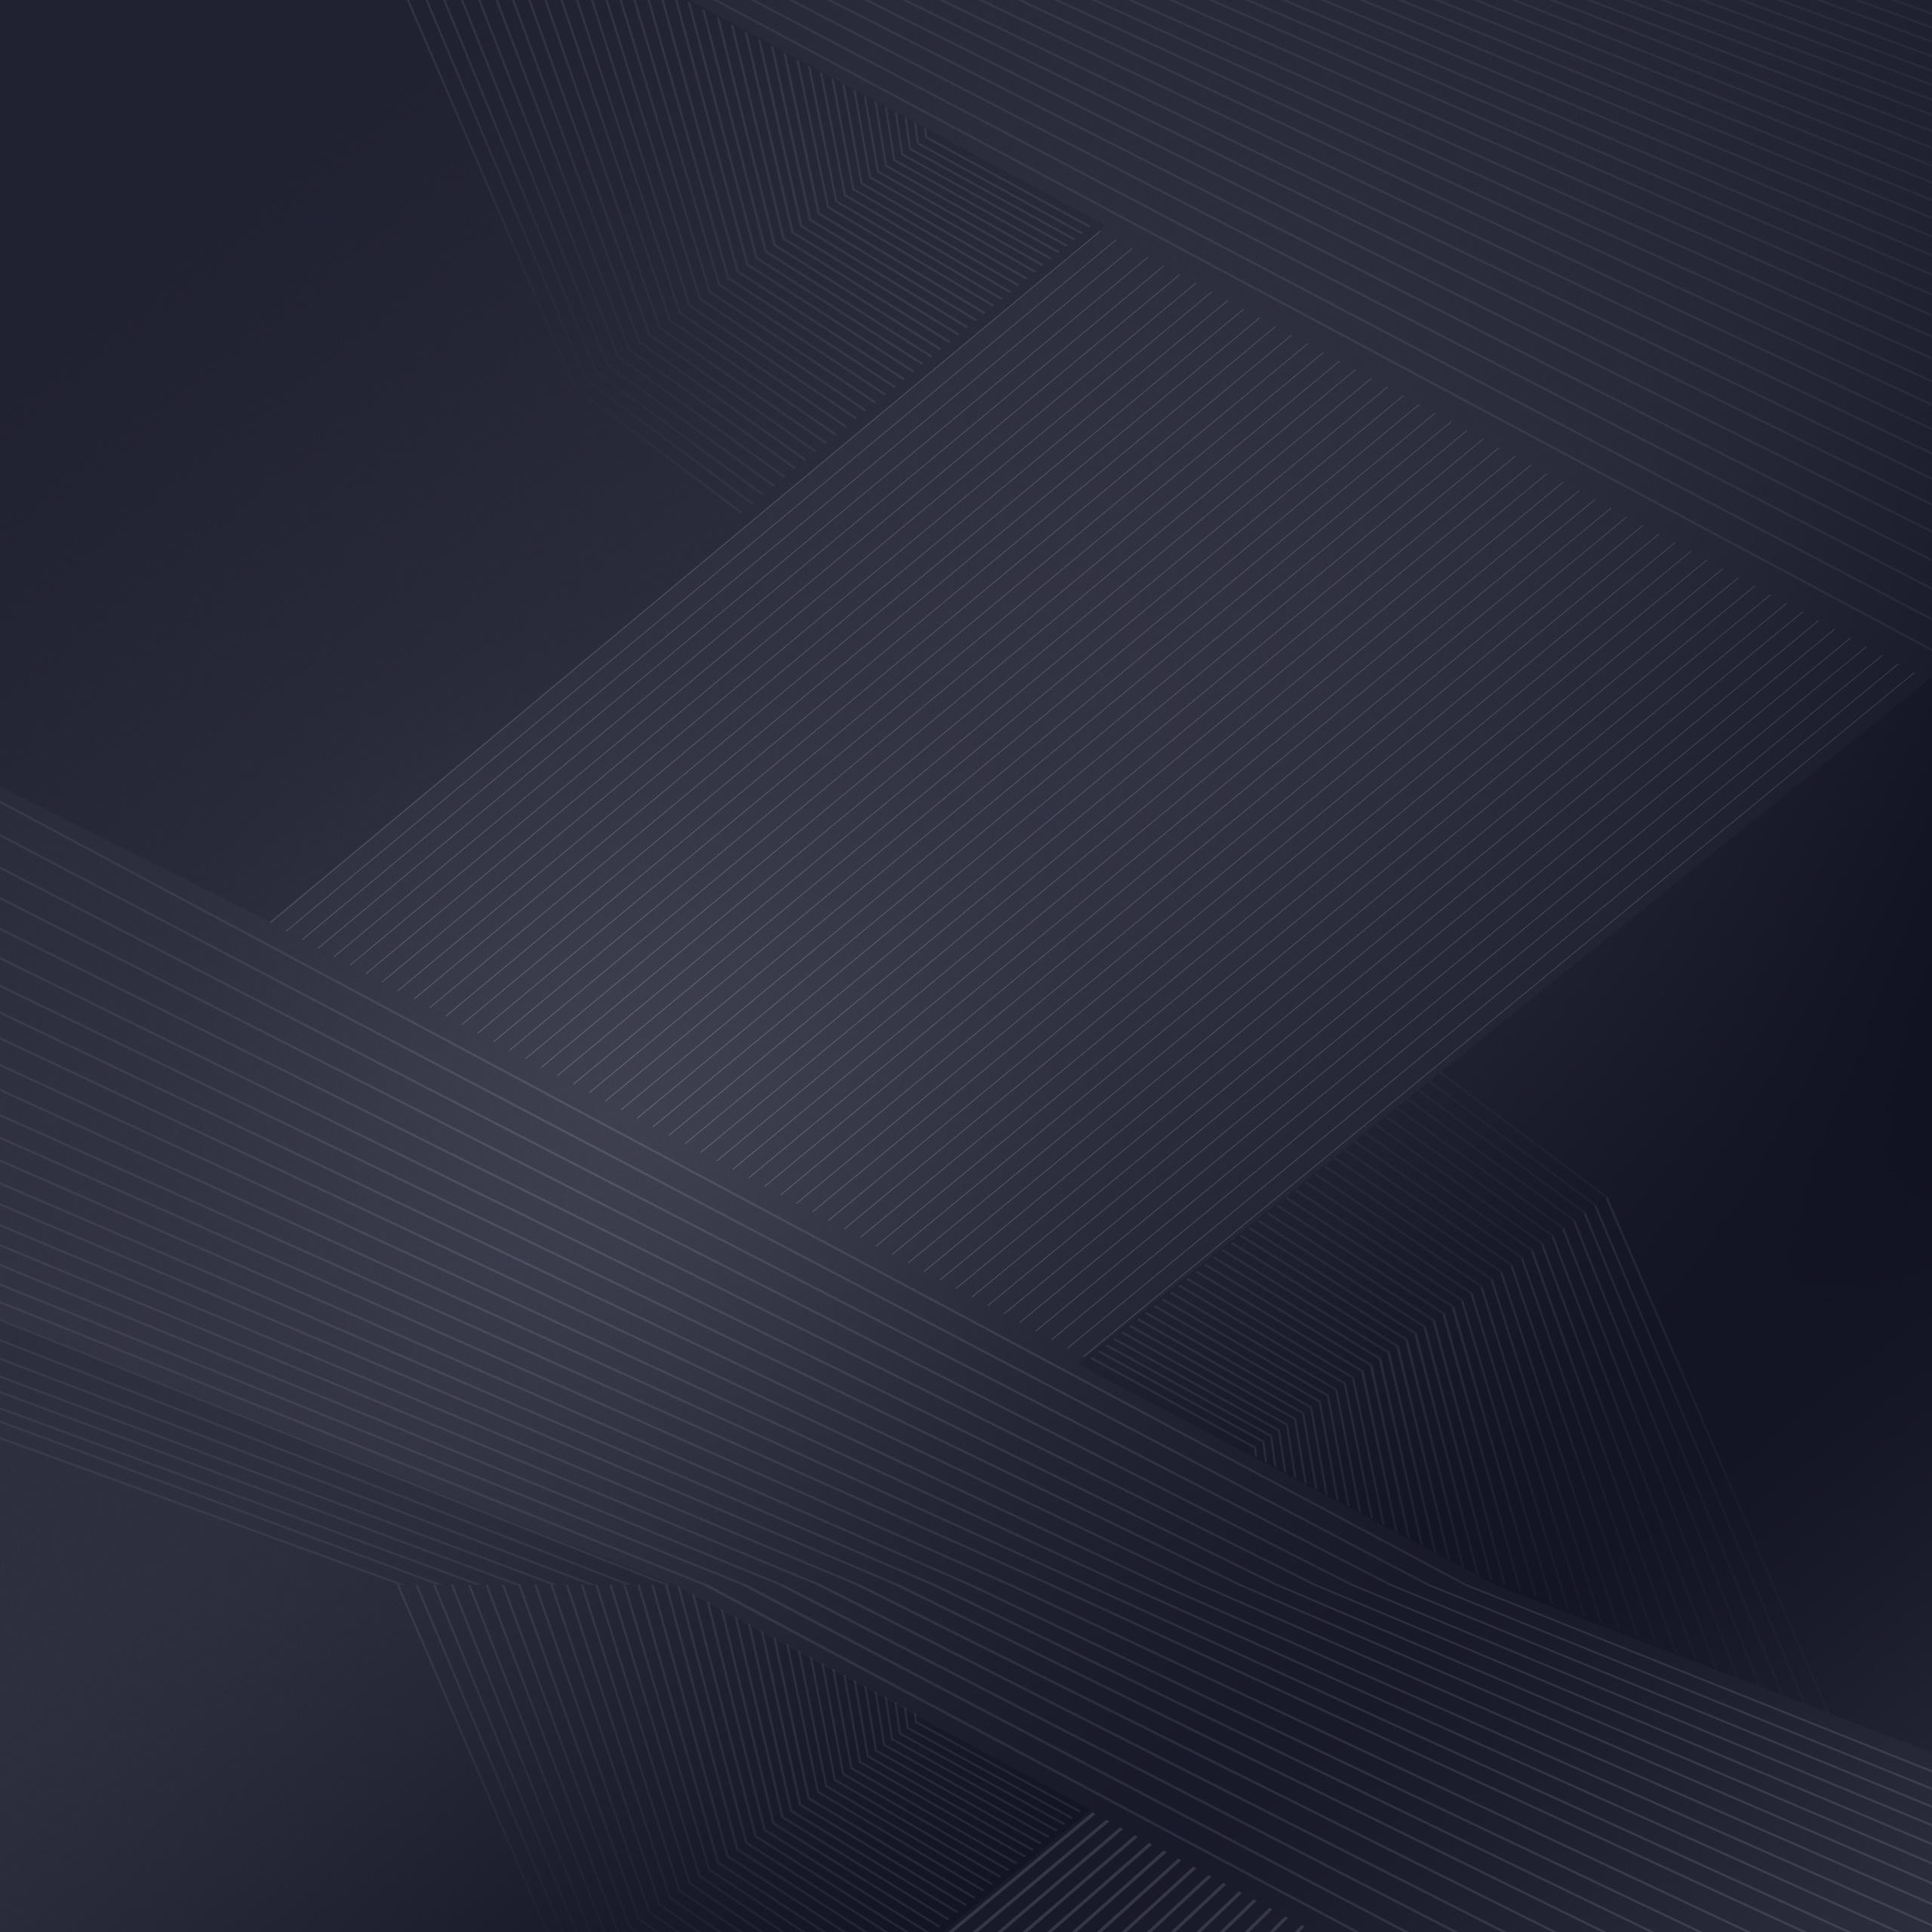 Free Download Samsung Galaxy S7 Wallpaper